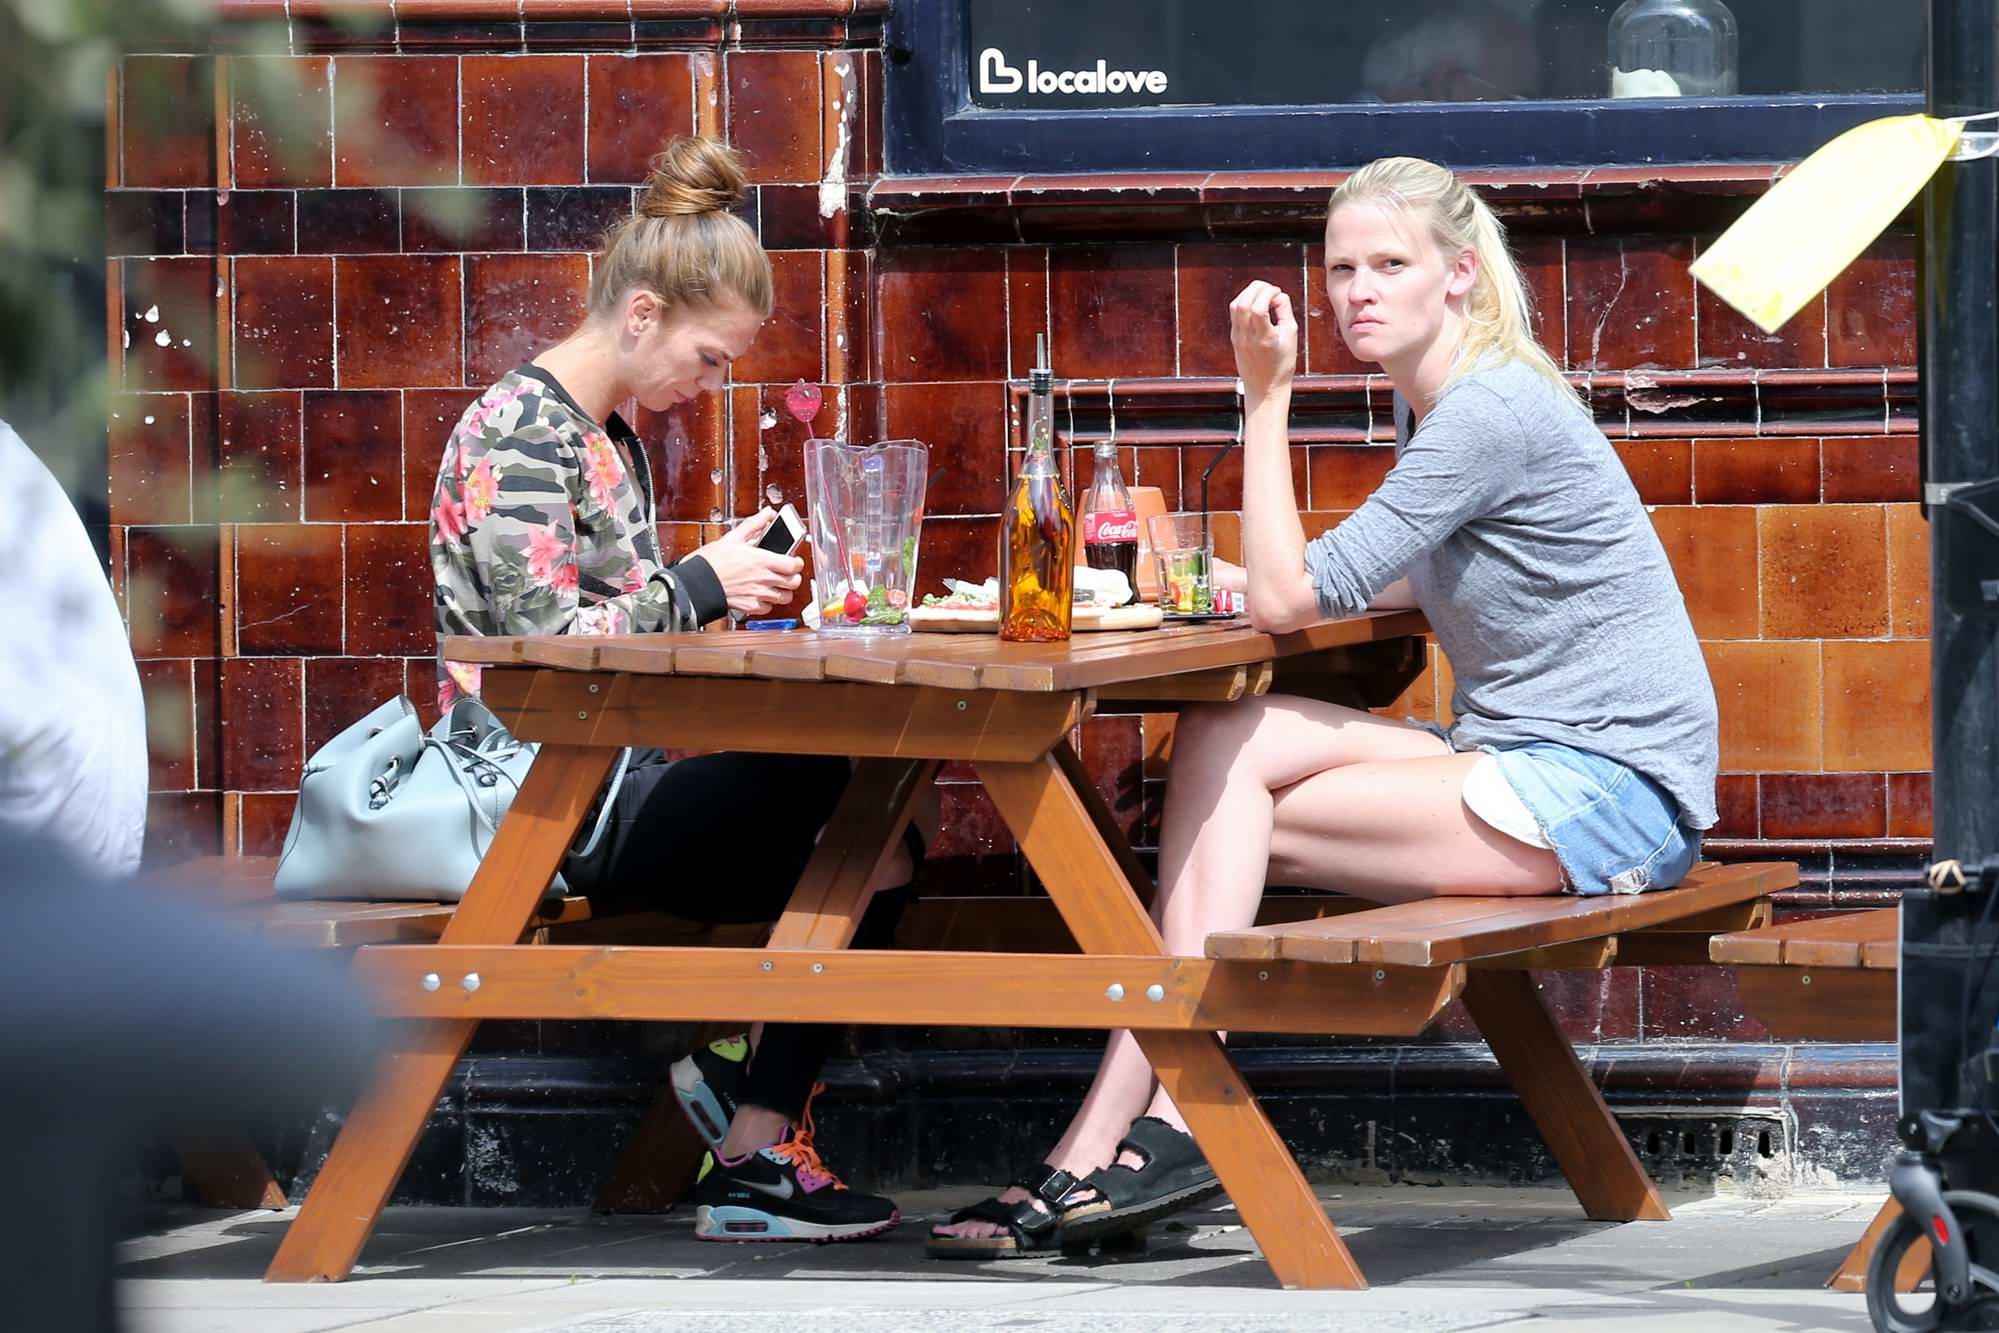 Lara Stone is seen enjoying an Al Fresco lunch with a girlfriend in North London